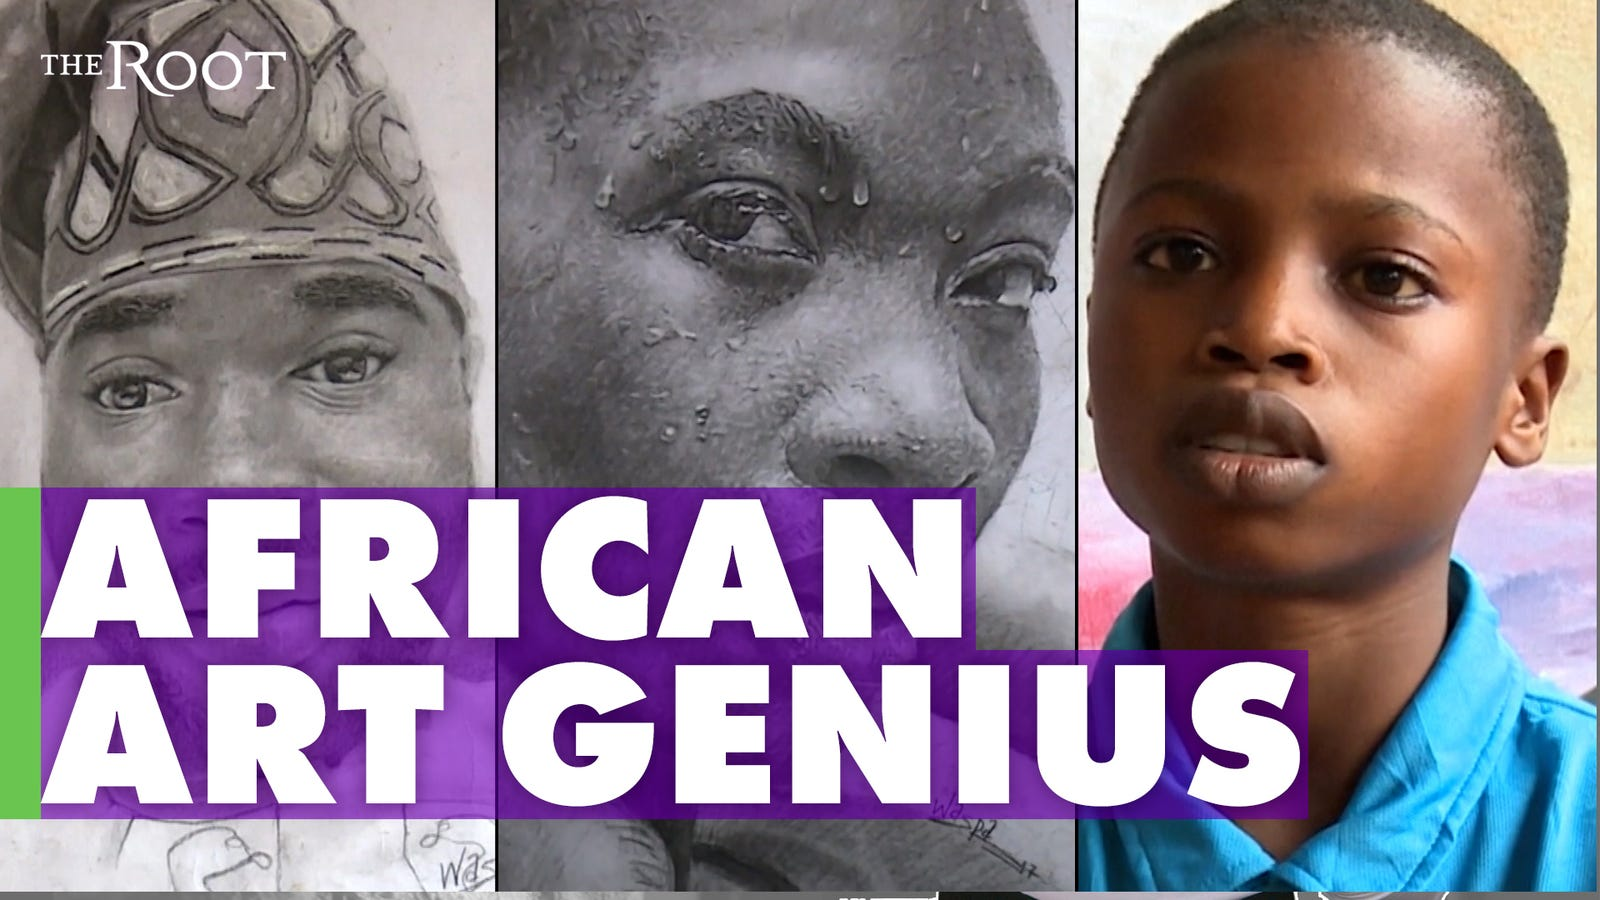 11-Year-Old Nigerian Artist Creates Stunning Portraits of Figures in